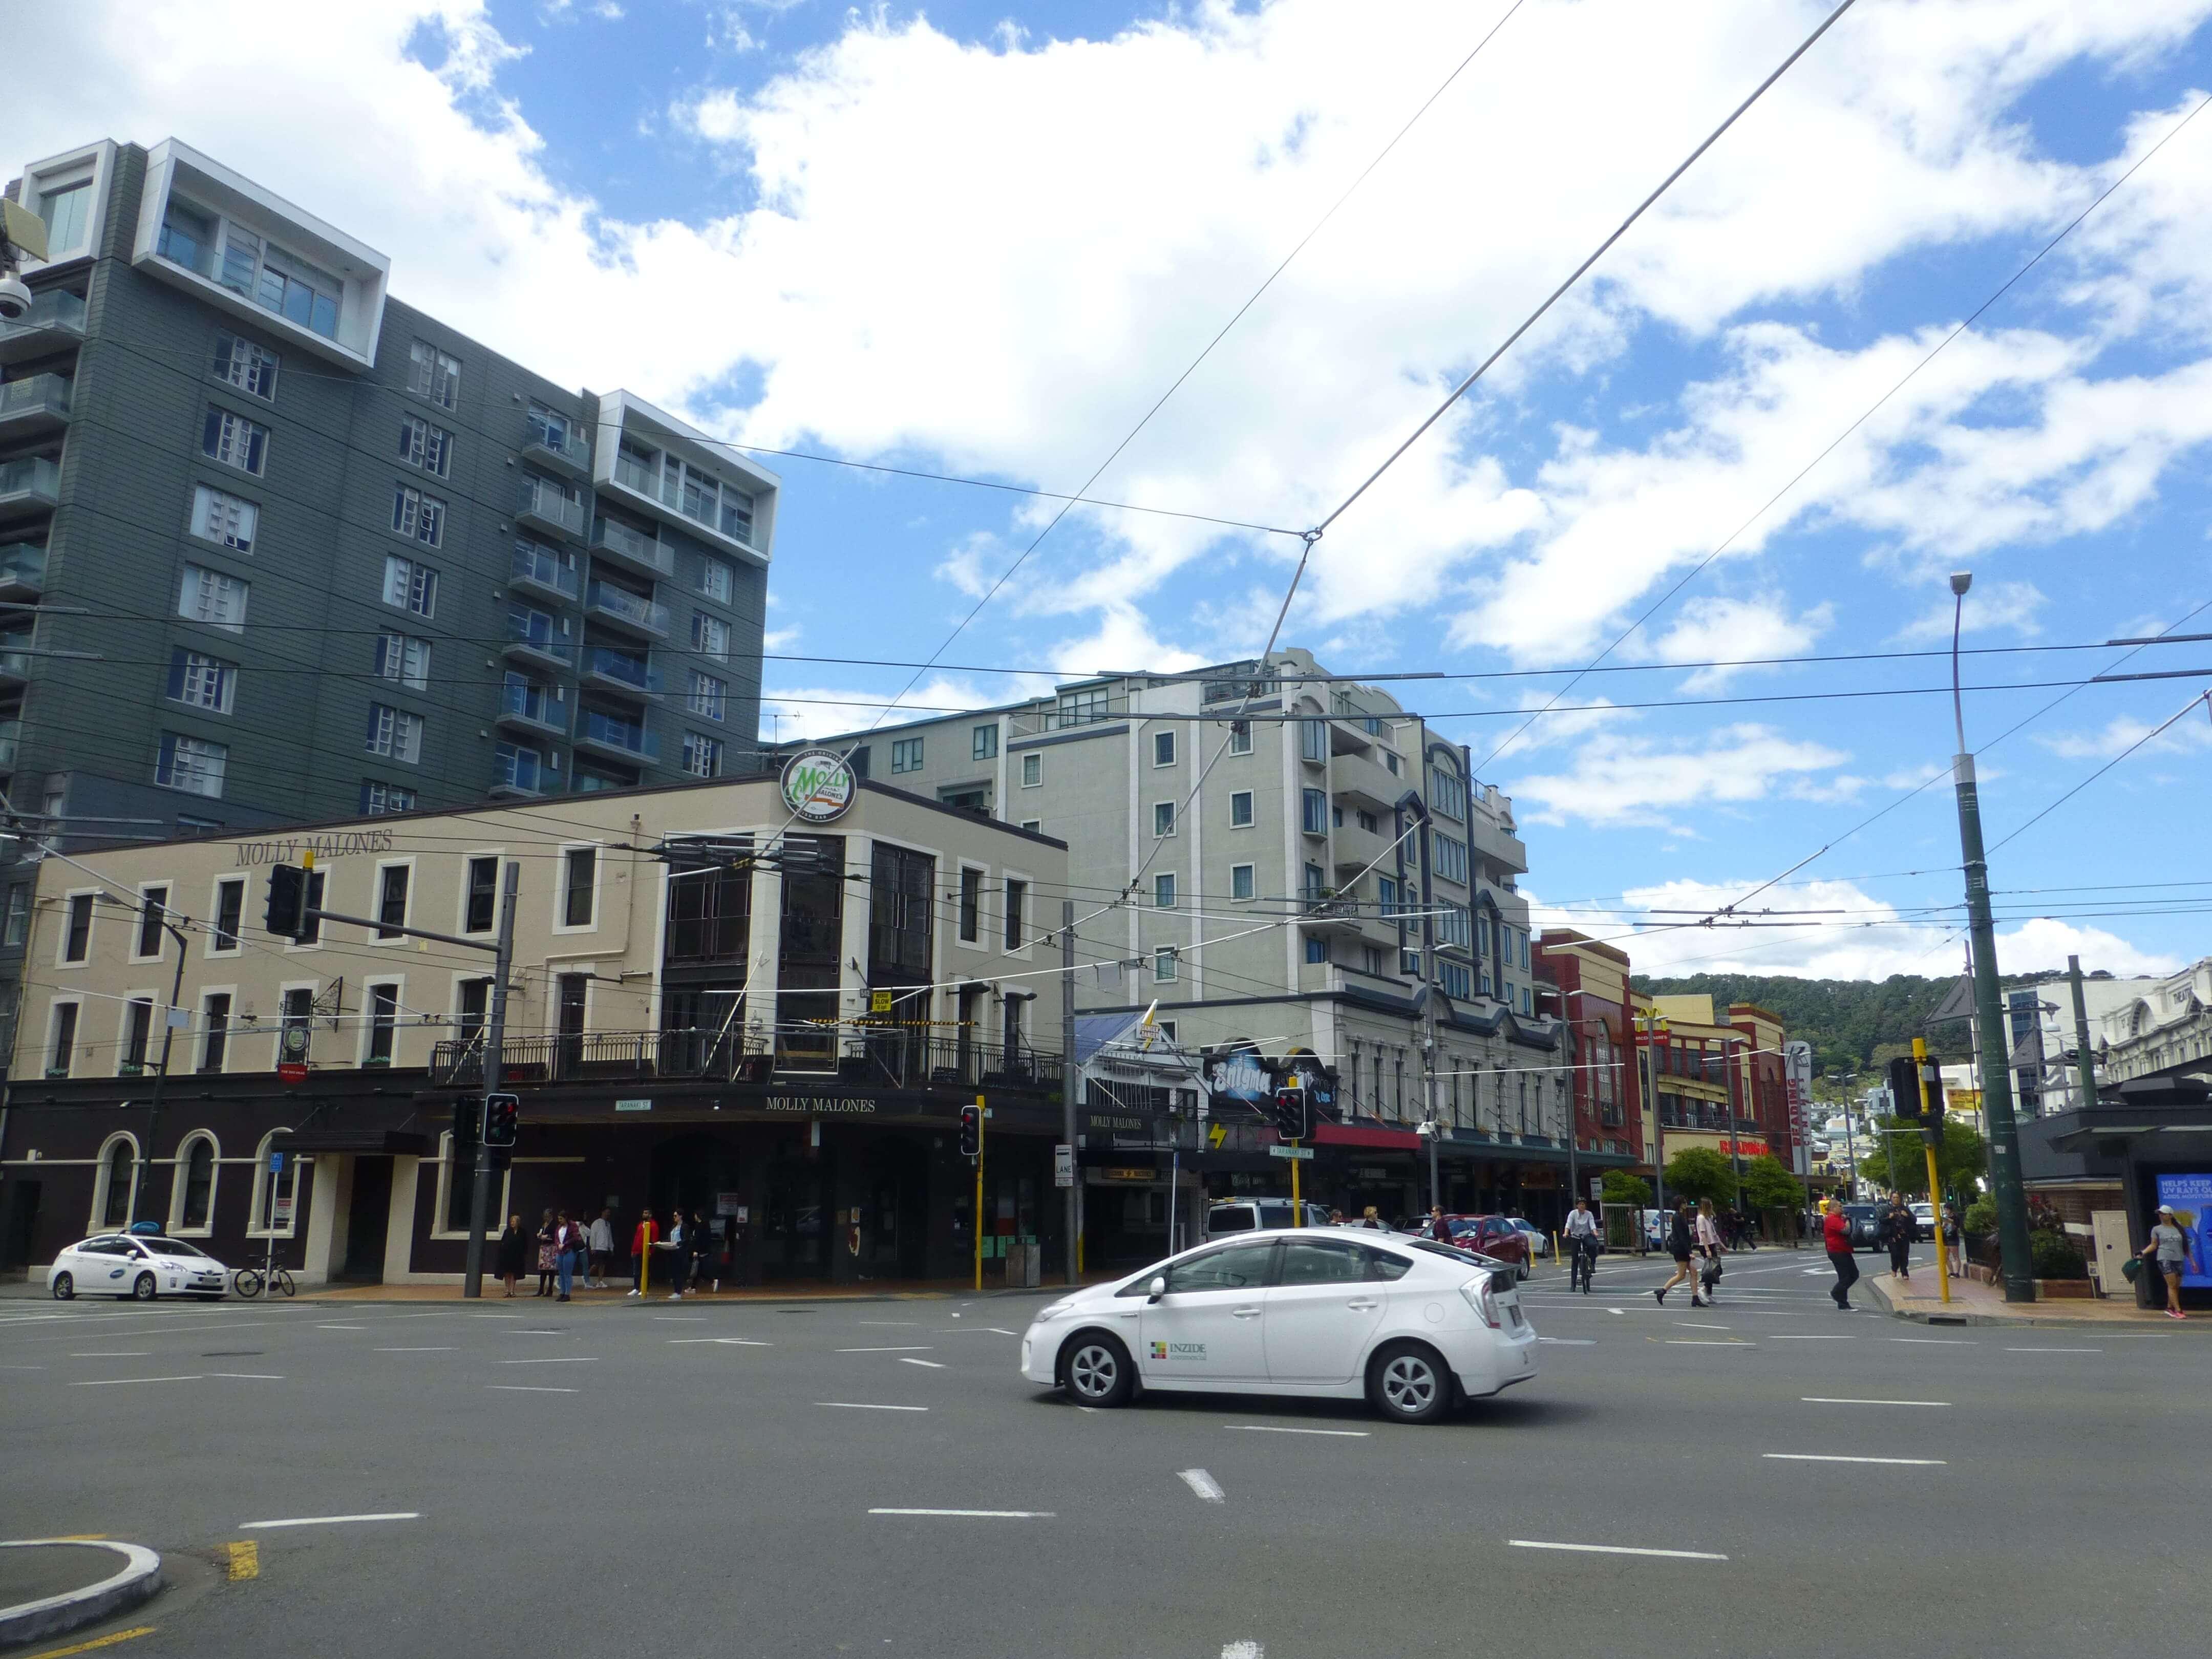 im Zentrum, Wellington, Neuseeland, Weit-weg.reisen 16